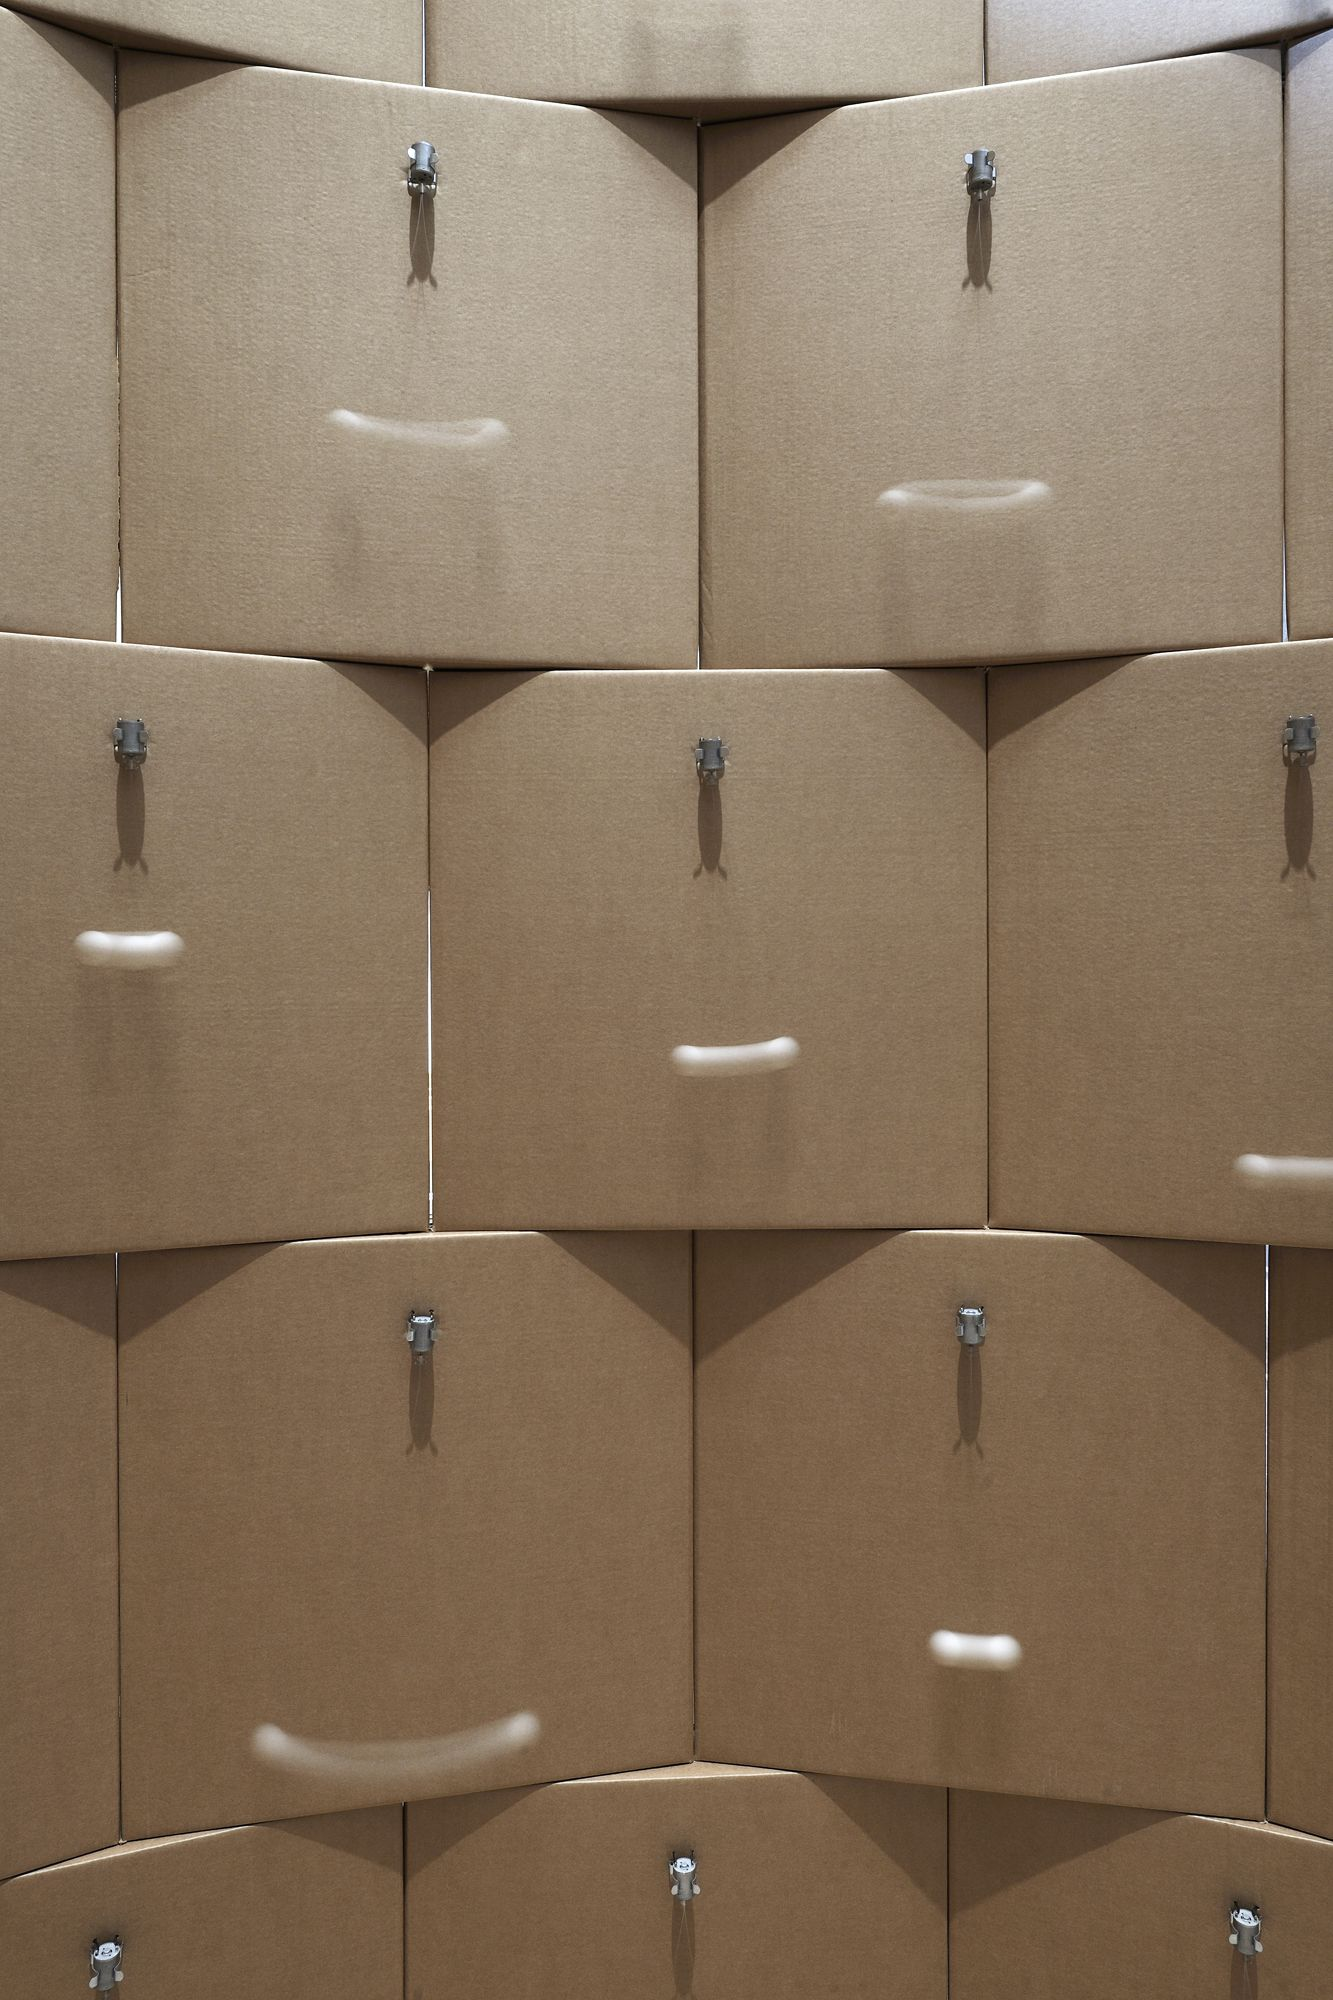 149 prepared dc-motors, cotton balls, cardboard boxes 60x60x60cm. Credits Paolo Terzi.